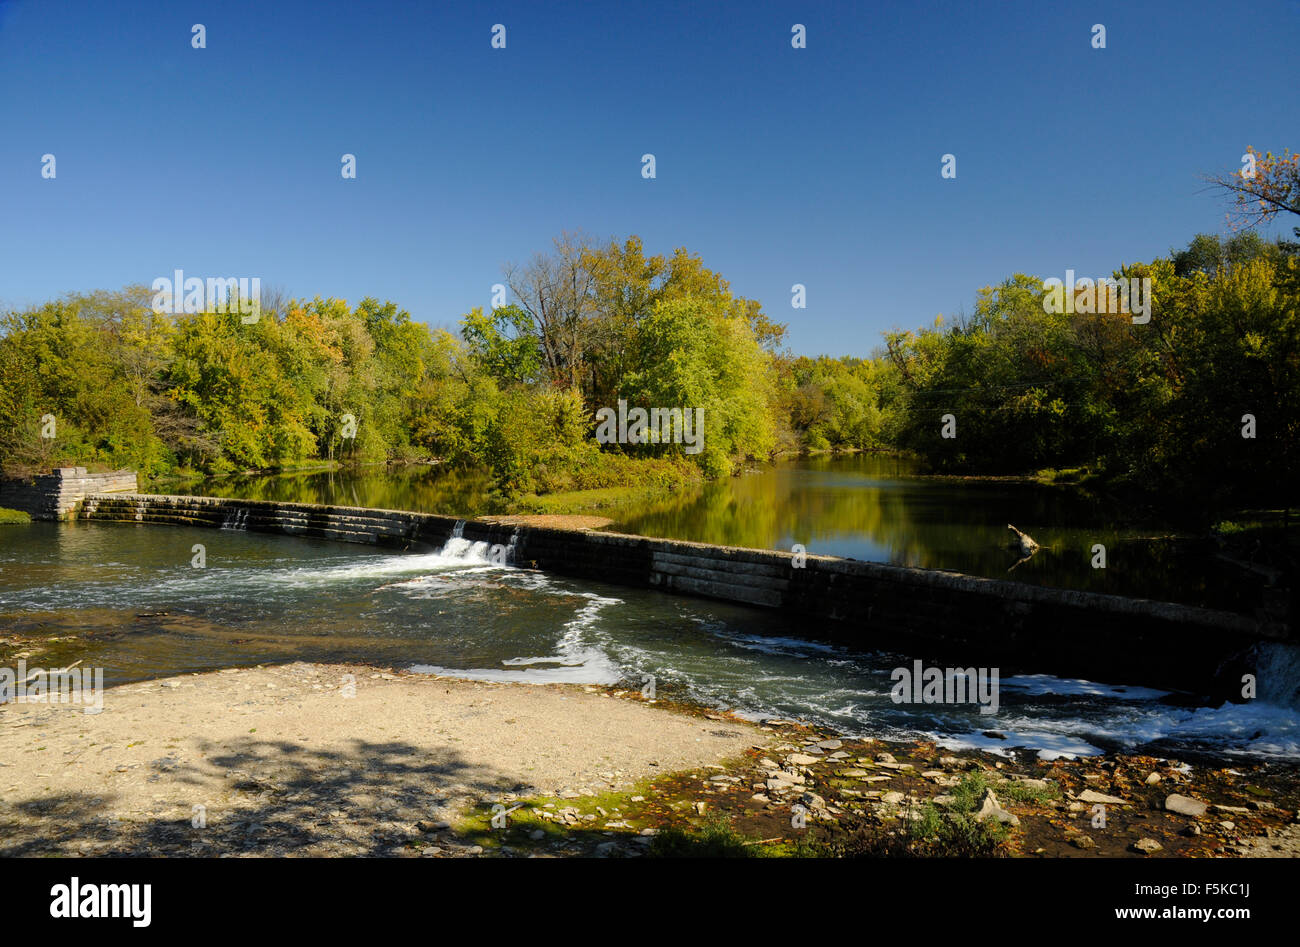 Dam on the Big Blue River, Edinburgh, Indiana Stock Photo: 89551662